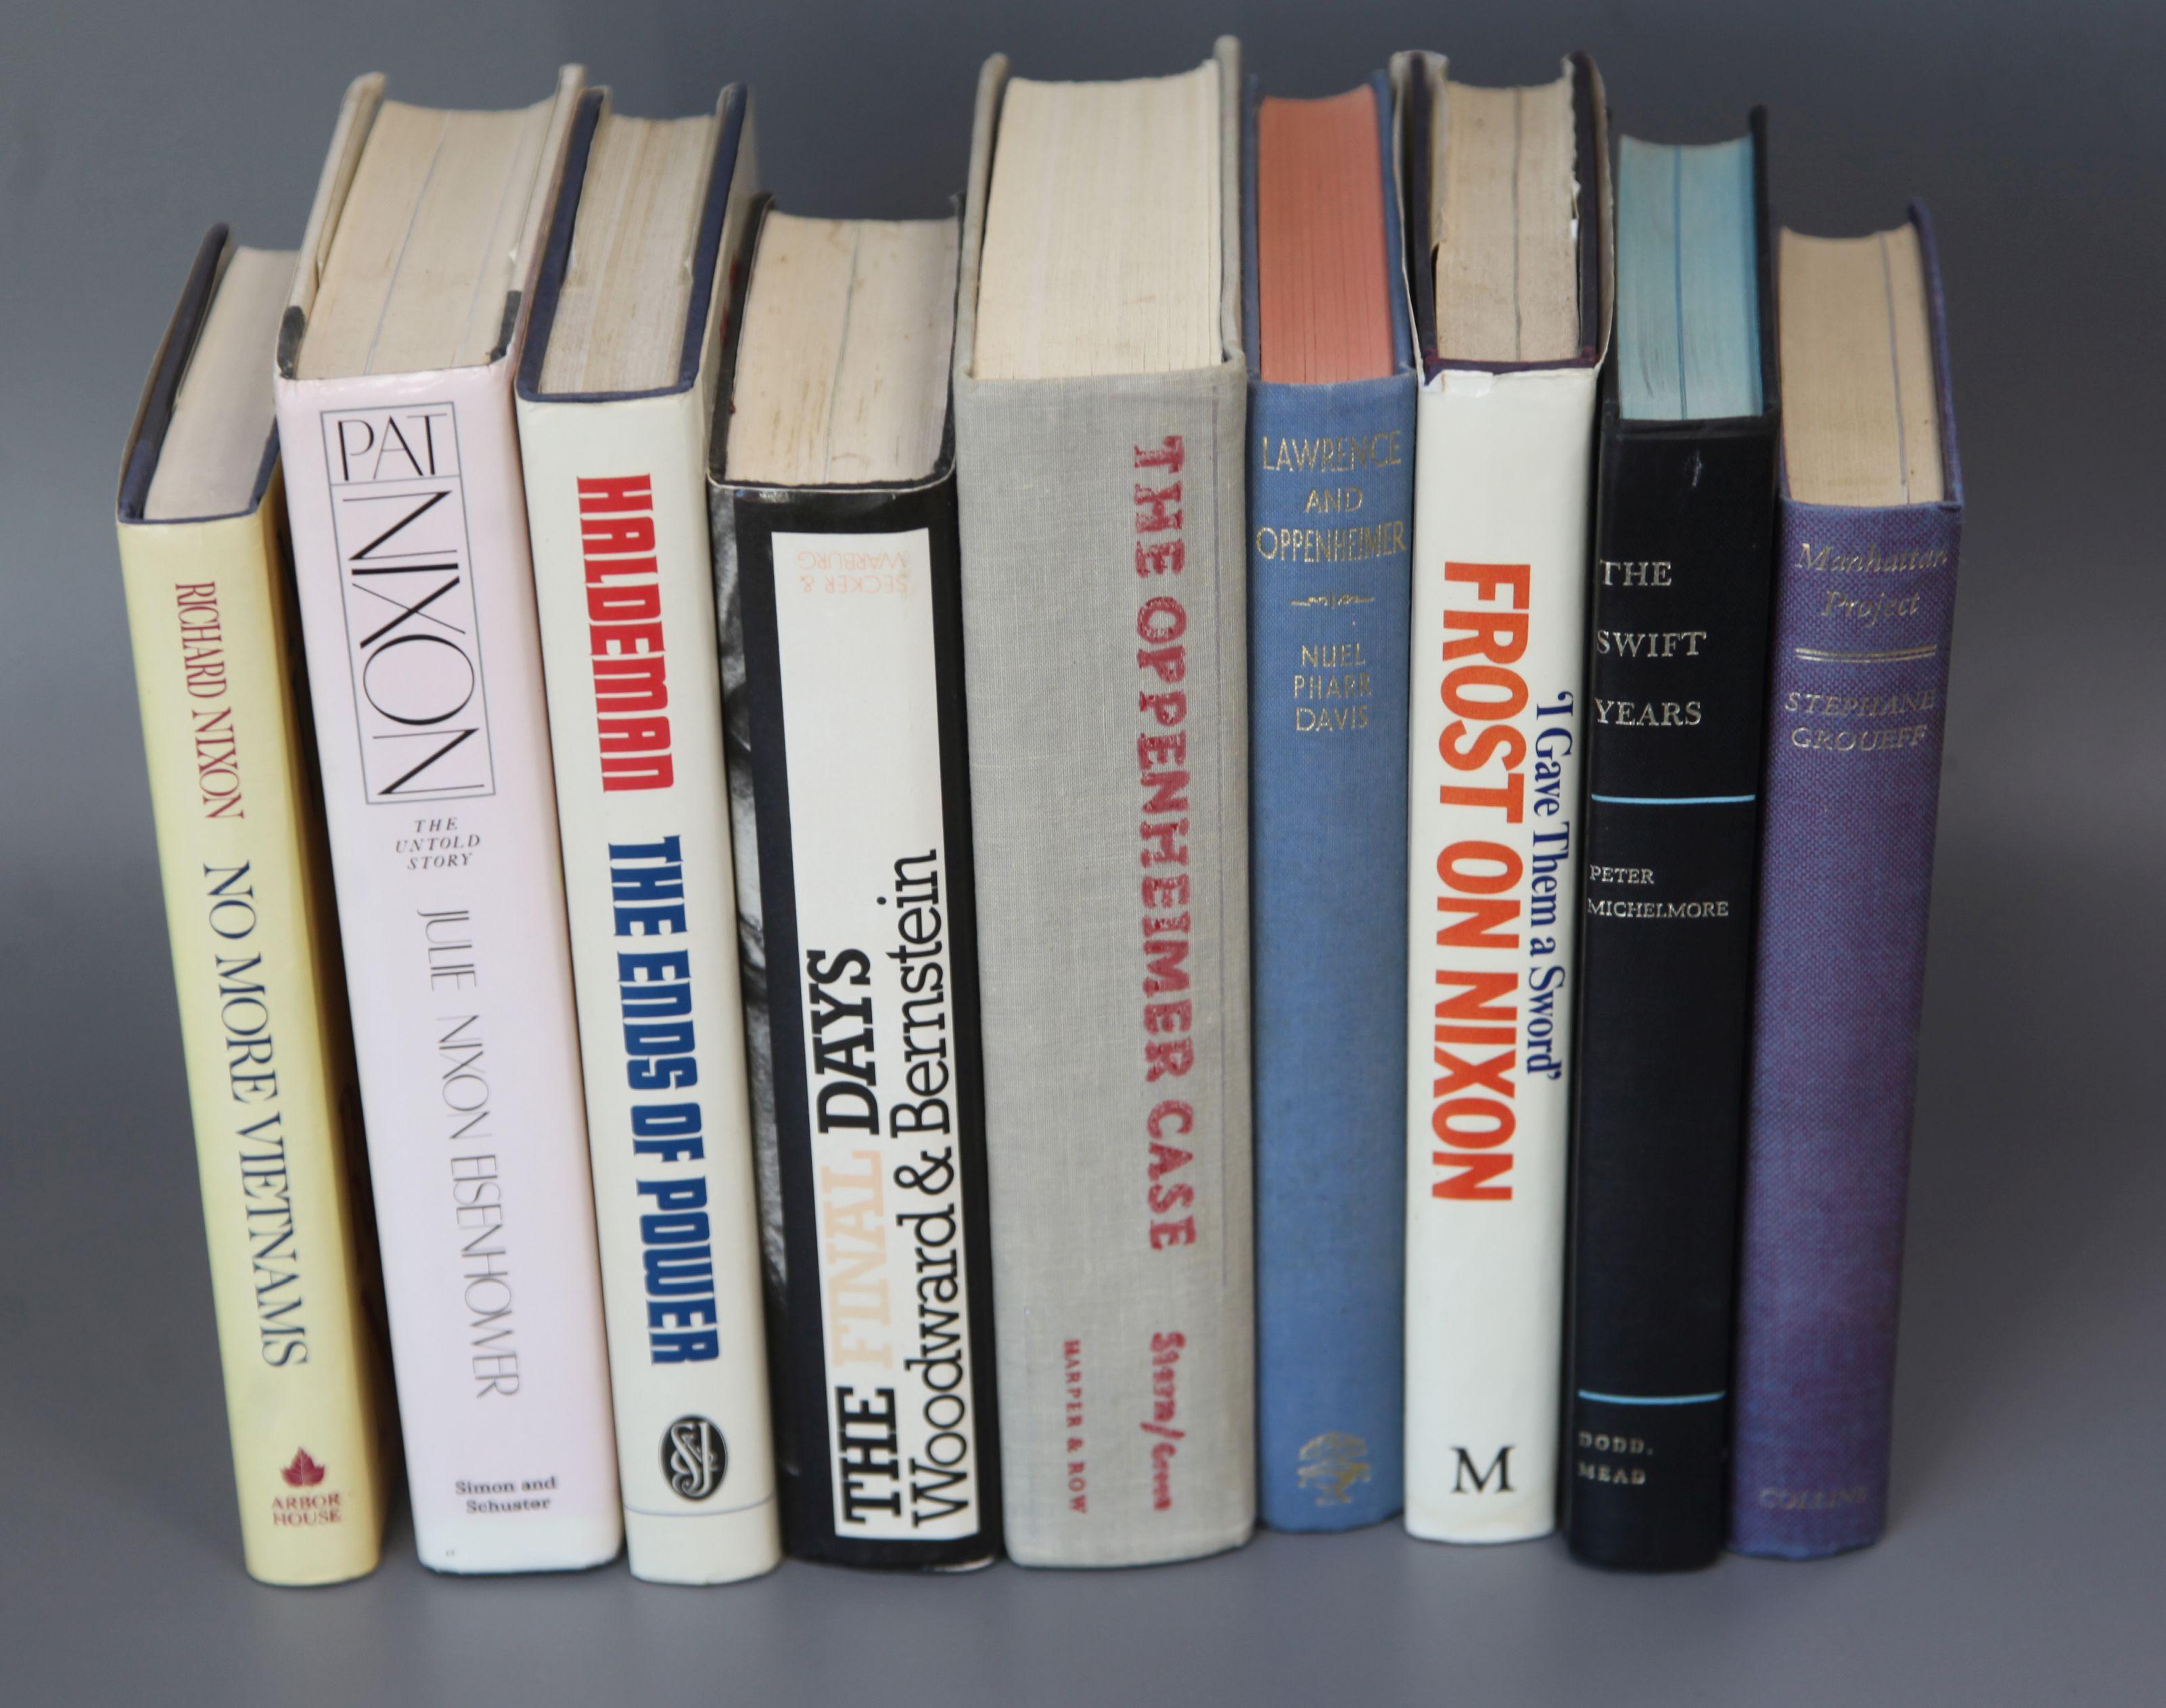 Lot 18 - Nixon, Richard M - No More Vietnams, New York, 1985 and 8 other volumes relating to Richard Nixon